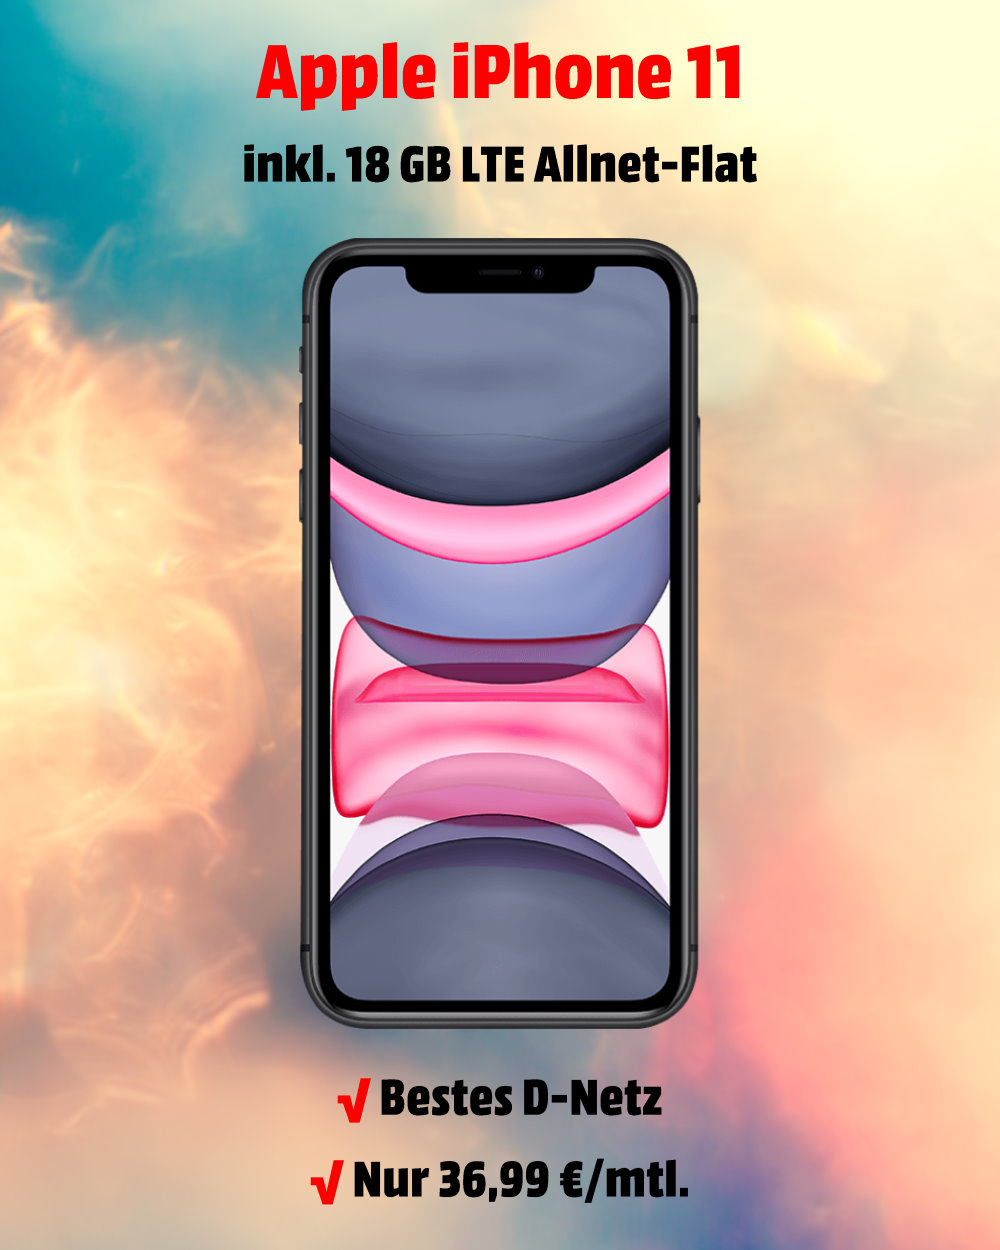 iPhone 11 Handyvertrag inkl. 18 GB LTE Allnet-Flat im besten D-Netz